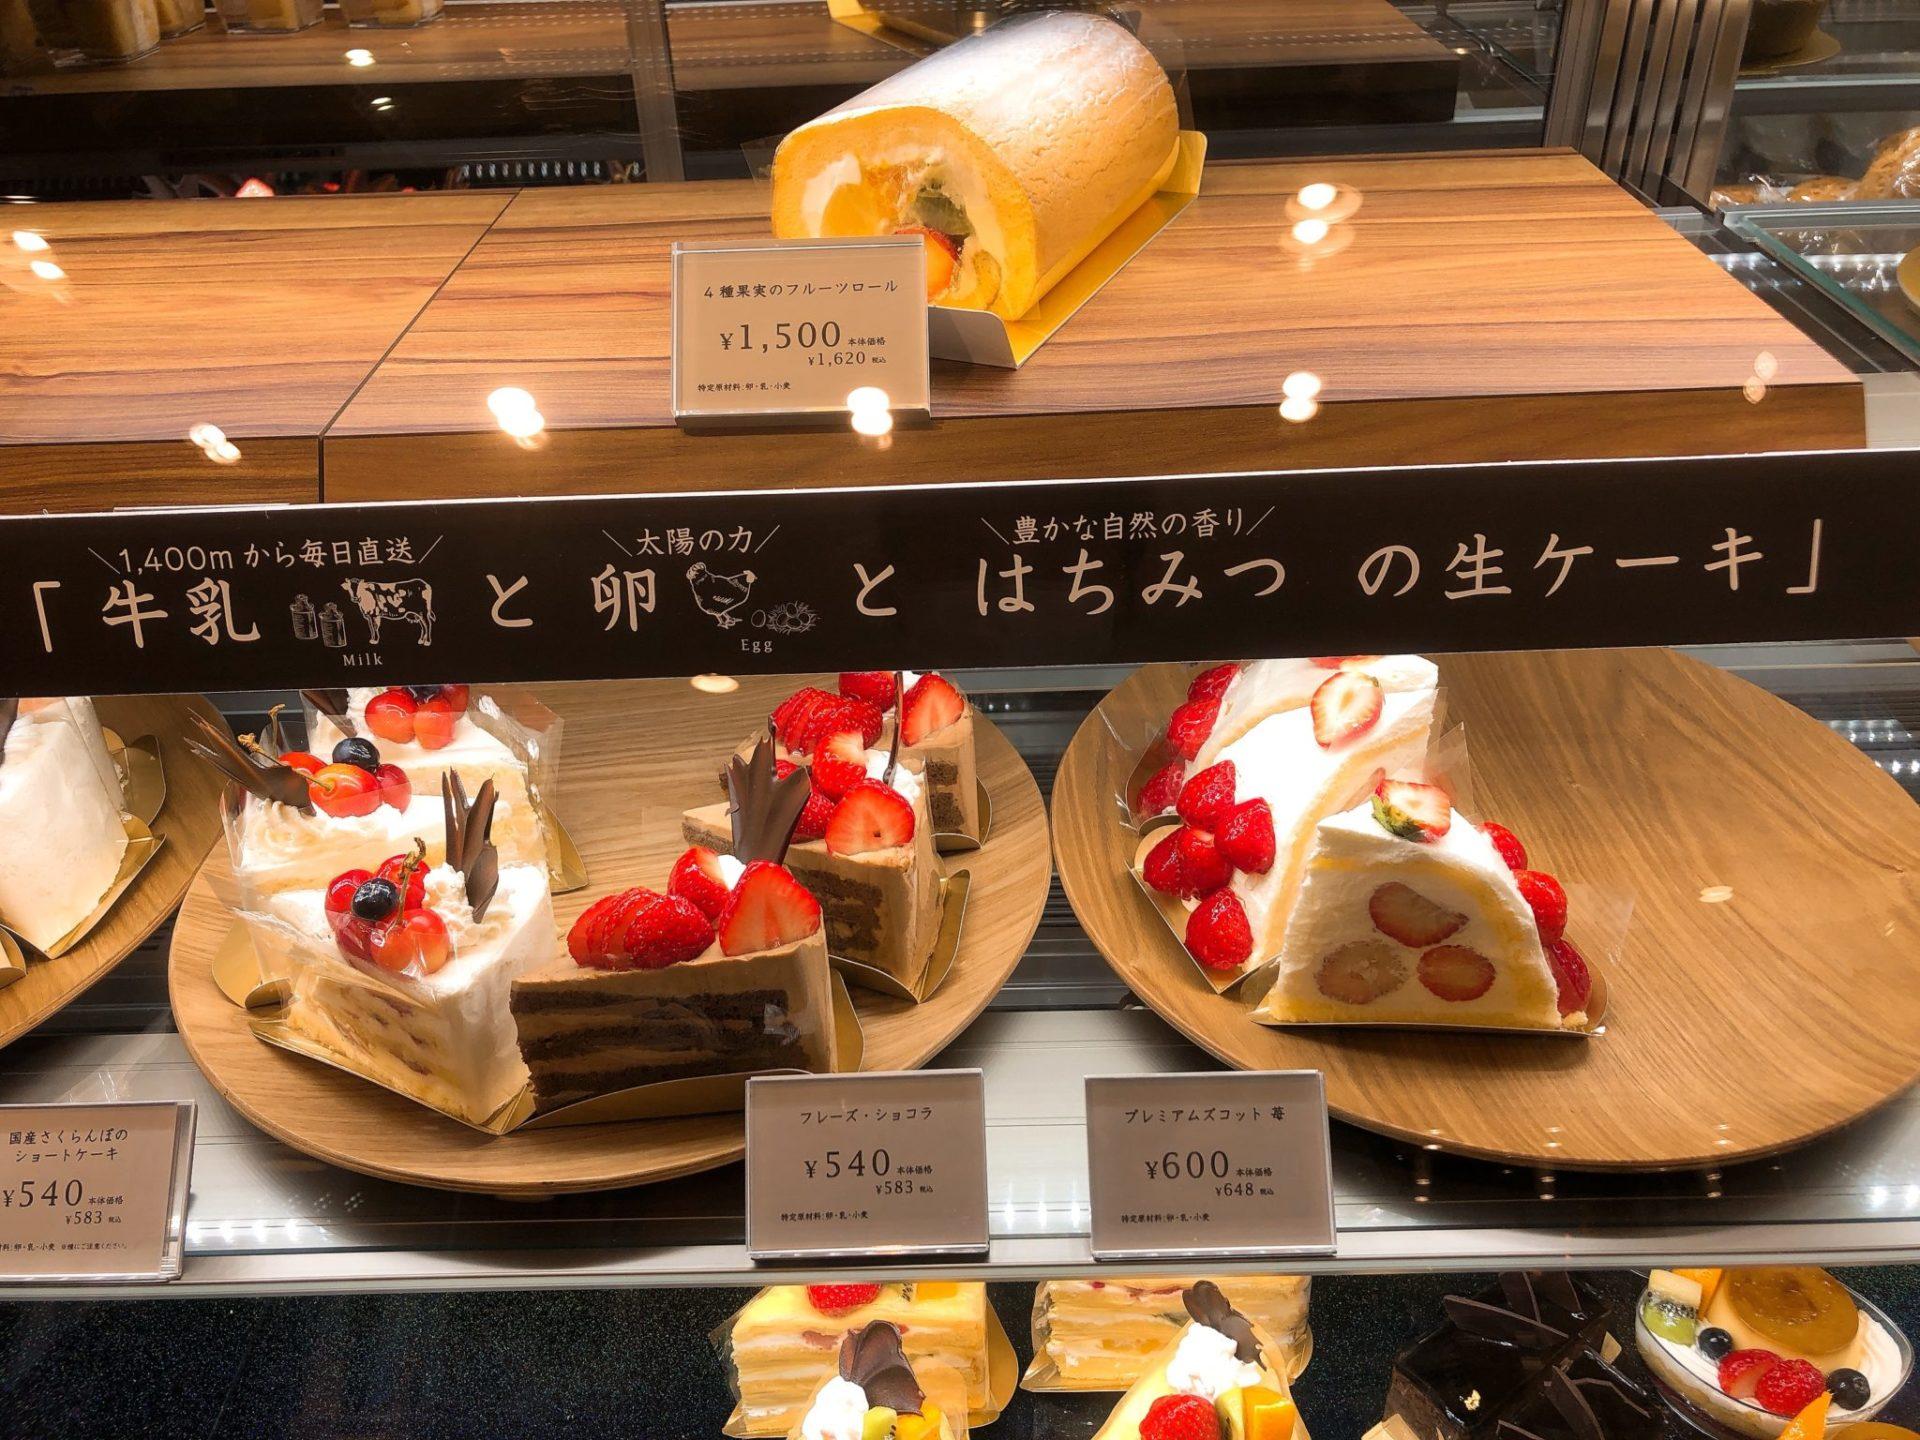 YATSUDOKI(ヤツドキ)新宿御苑店 ケーキメニュー ロールケーキ